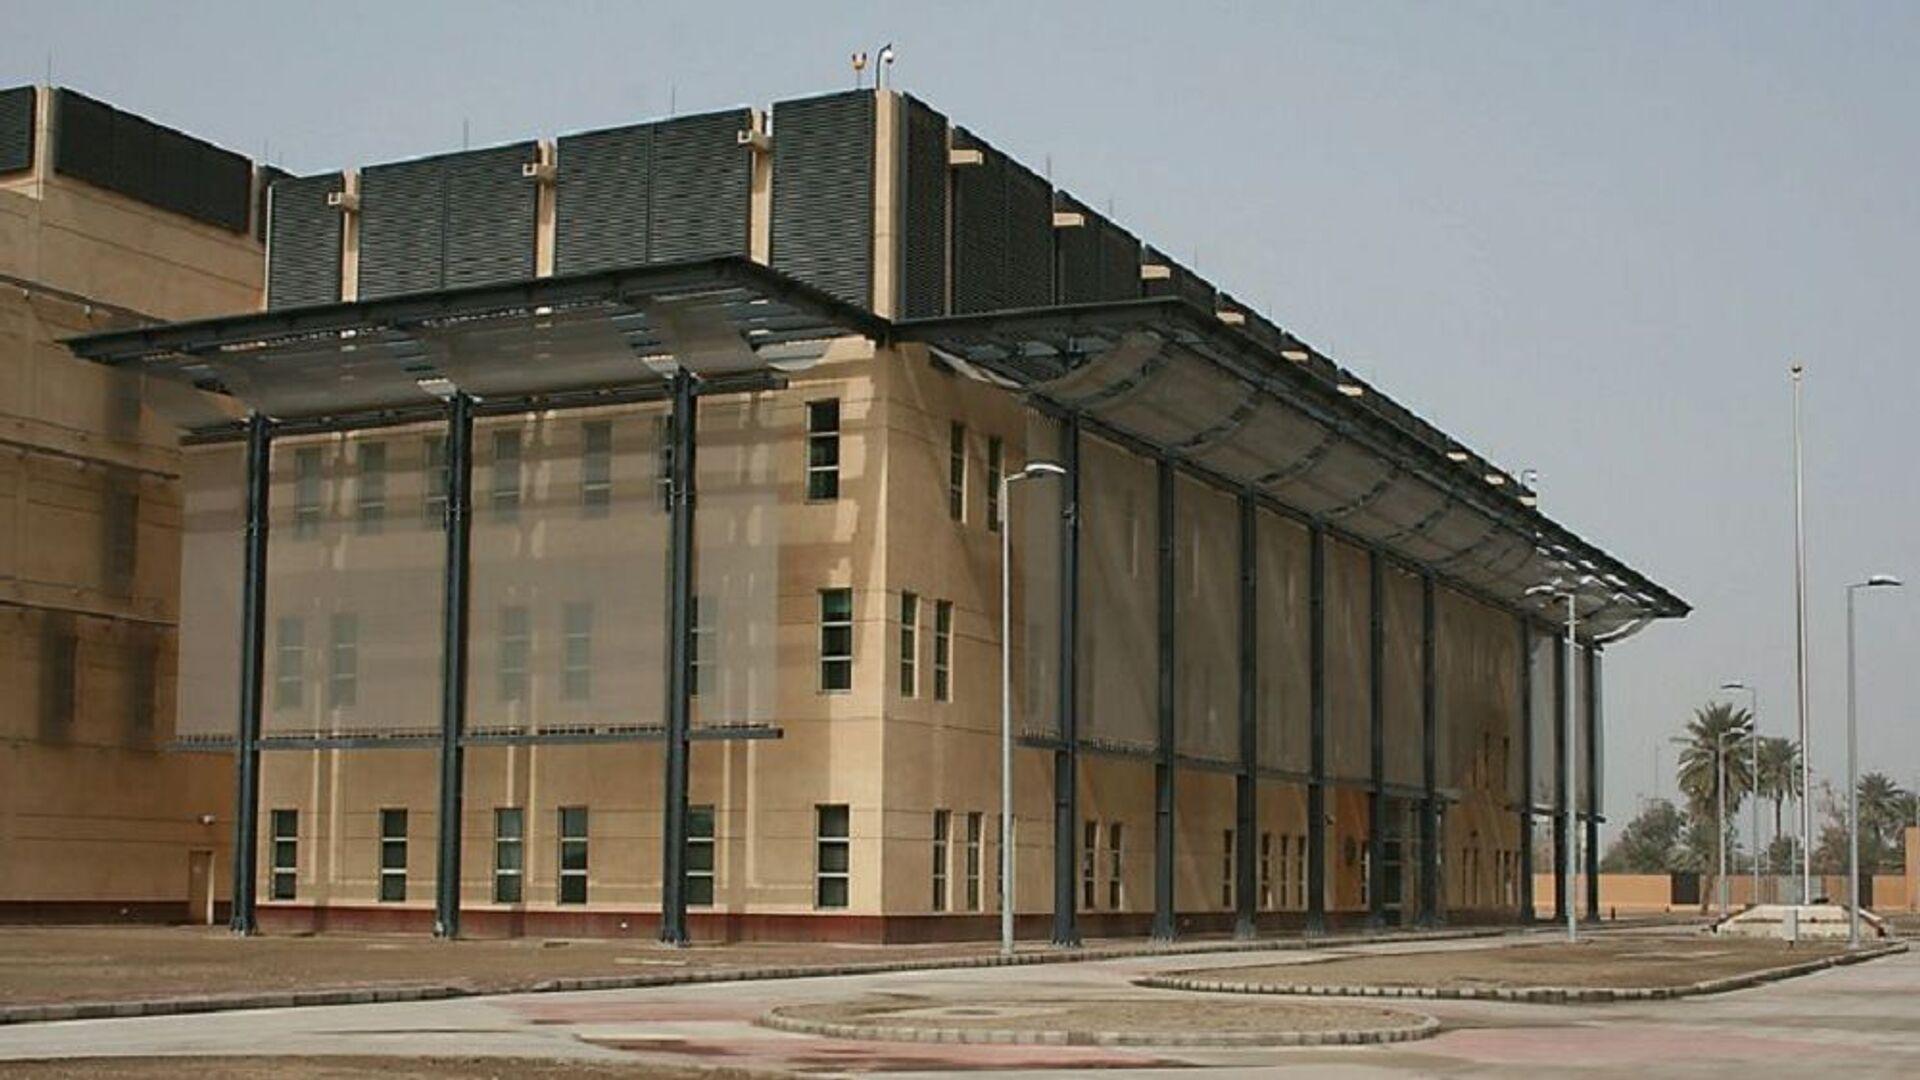 The new Embassy of the United States in Baghdad, Iraq - Sputnik Italia, 1920, 08.07.2021